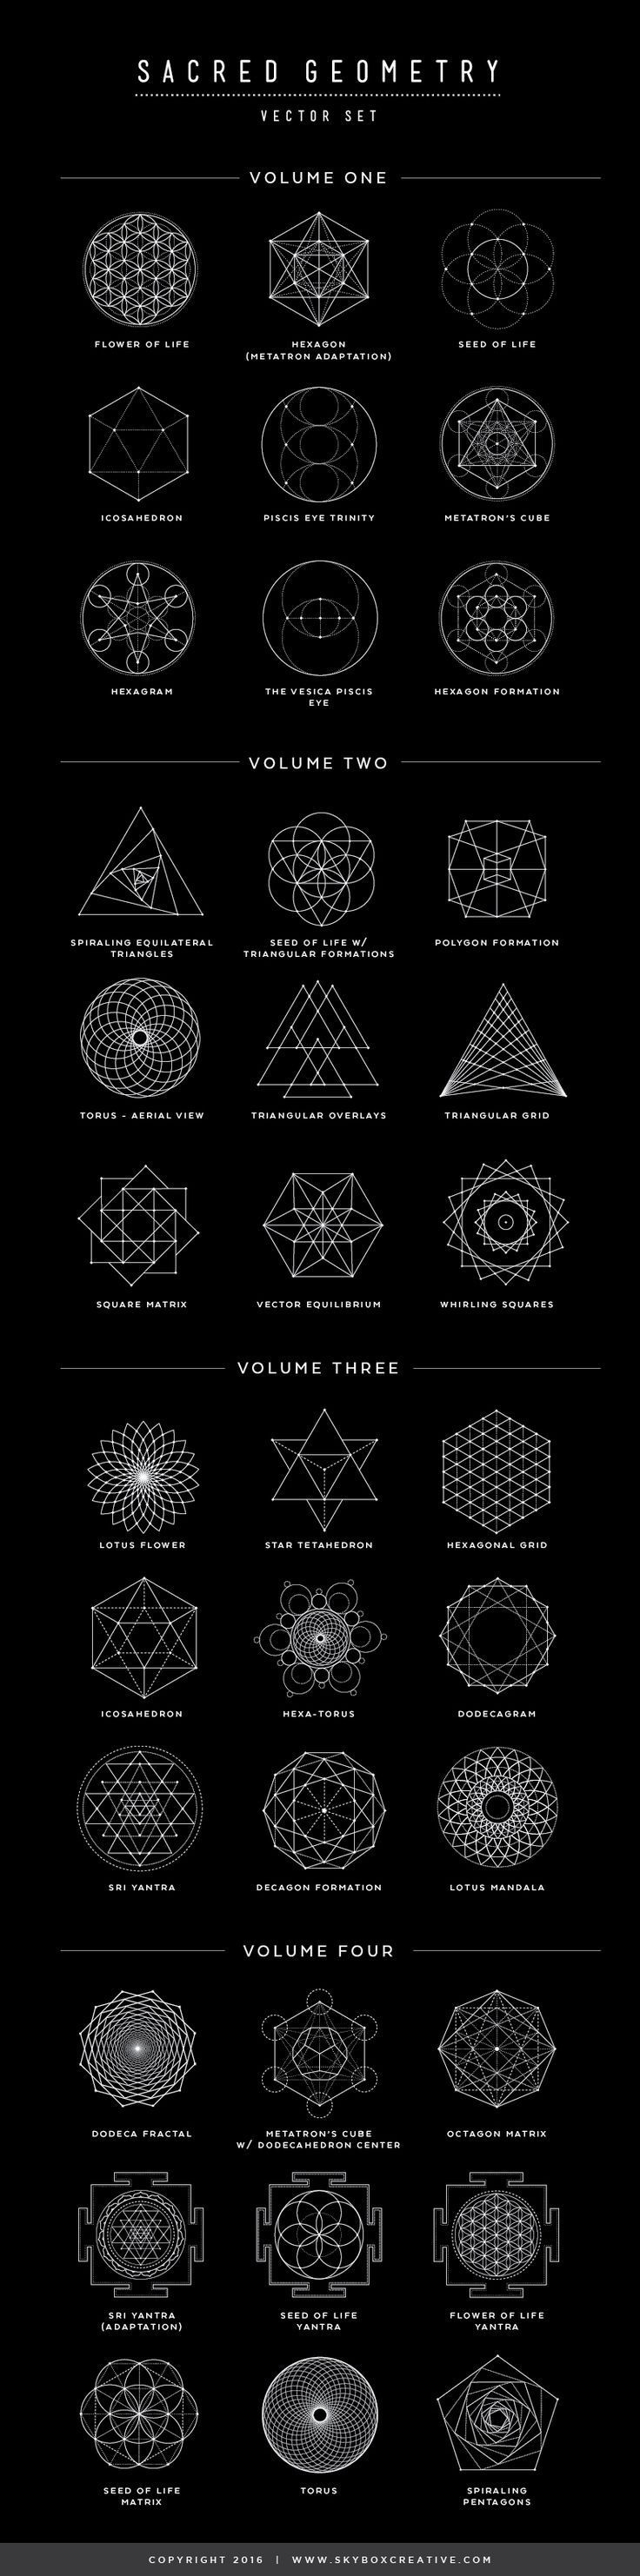 Geometric Tattoo – 2017 trend Geometric Tattoo – Sacred Geometry symbols, their names and meanings-…